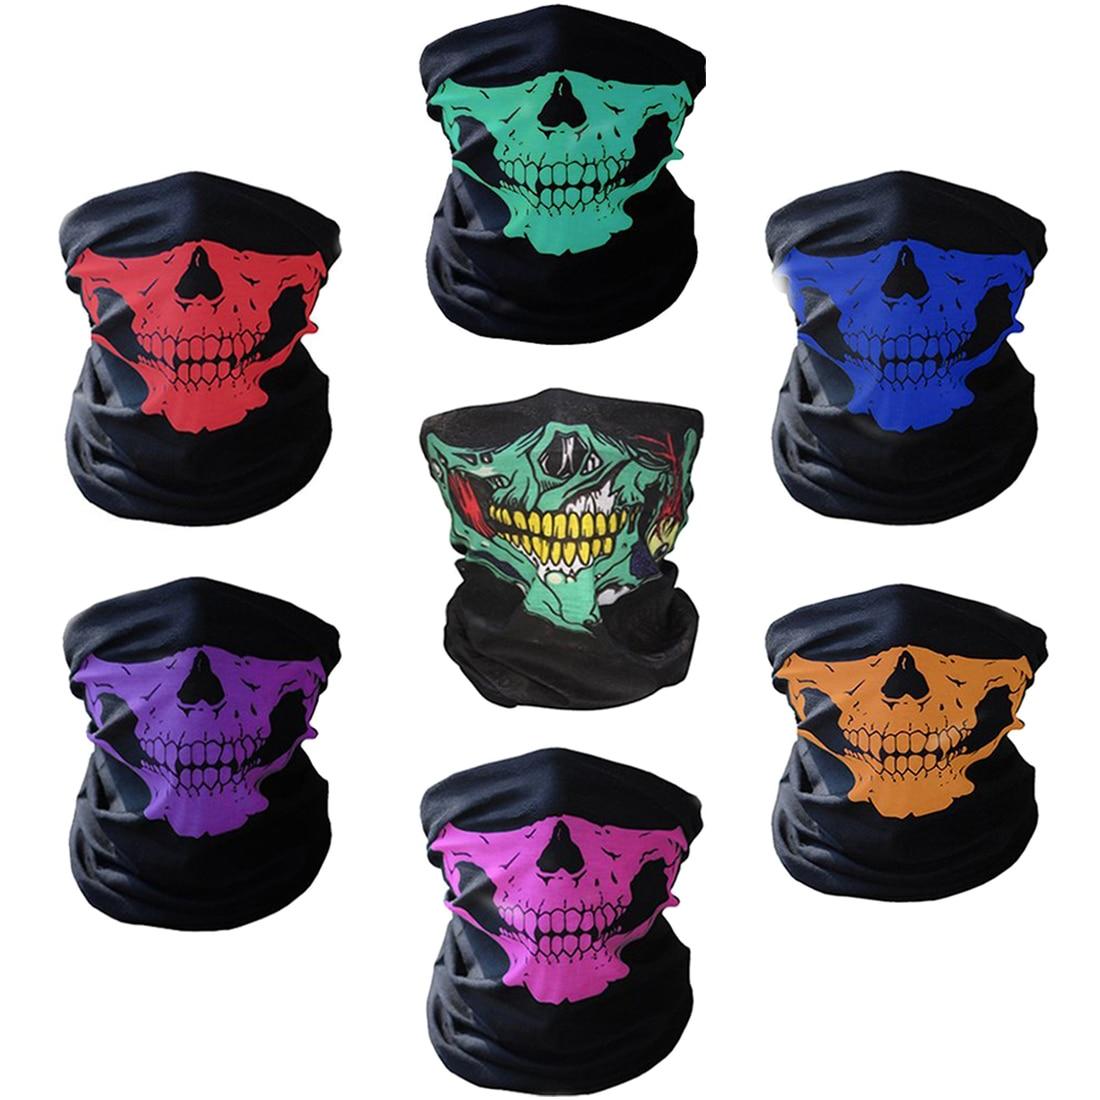 Beautiful 1pc Fashion Skull Masks Skeleton Outdoor Bicycle Multi Function Neck Warmer Ghost Scarves Magic Scarf Men Women More Discounts Surprises Men's Scarves